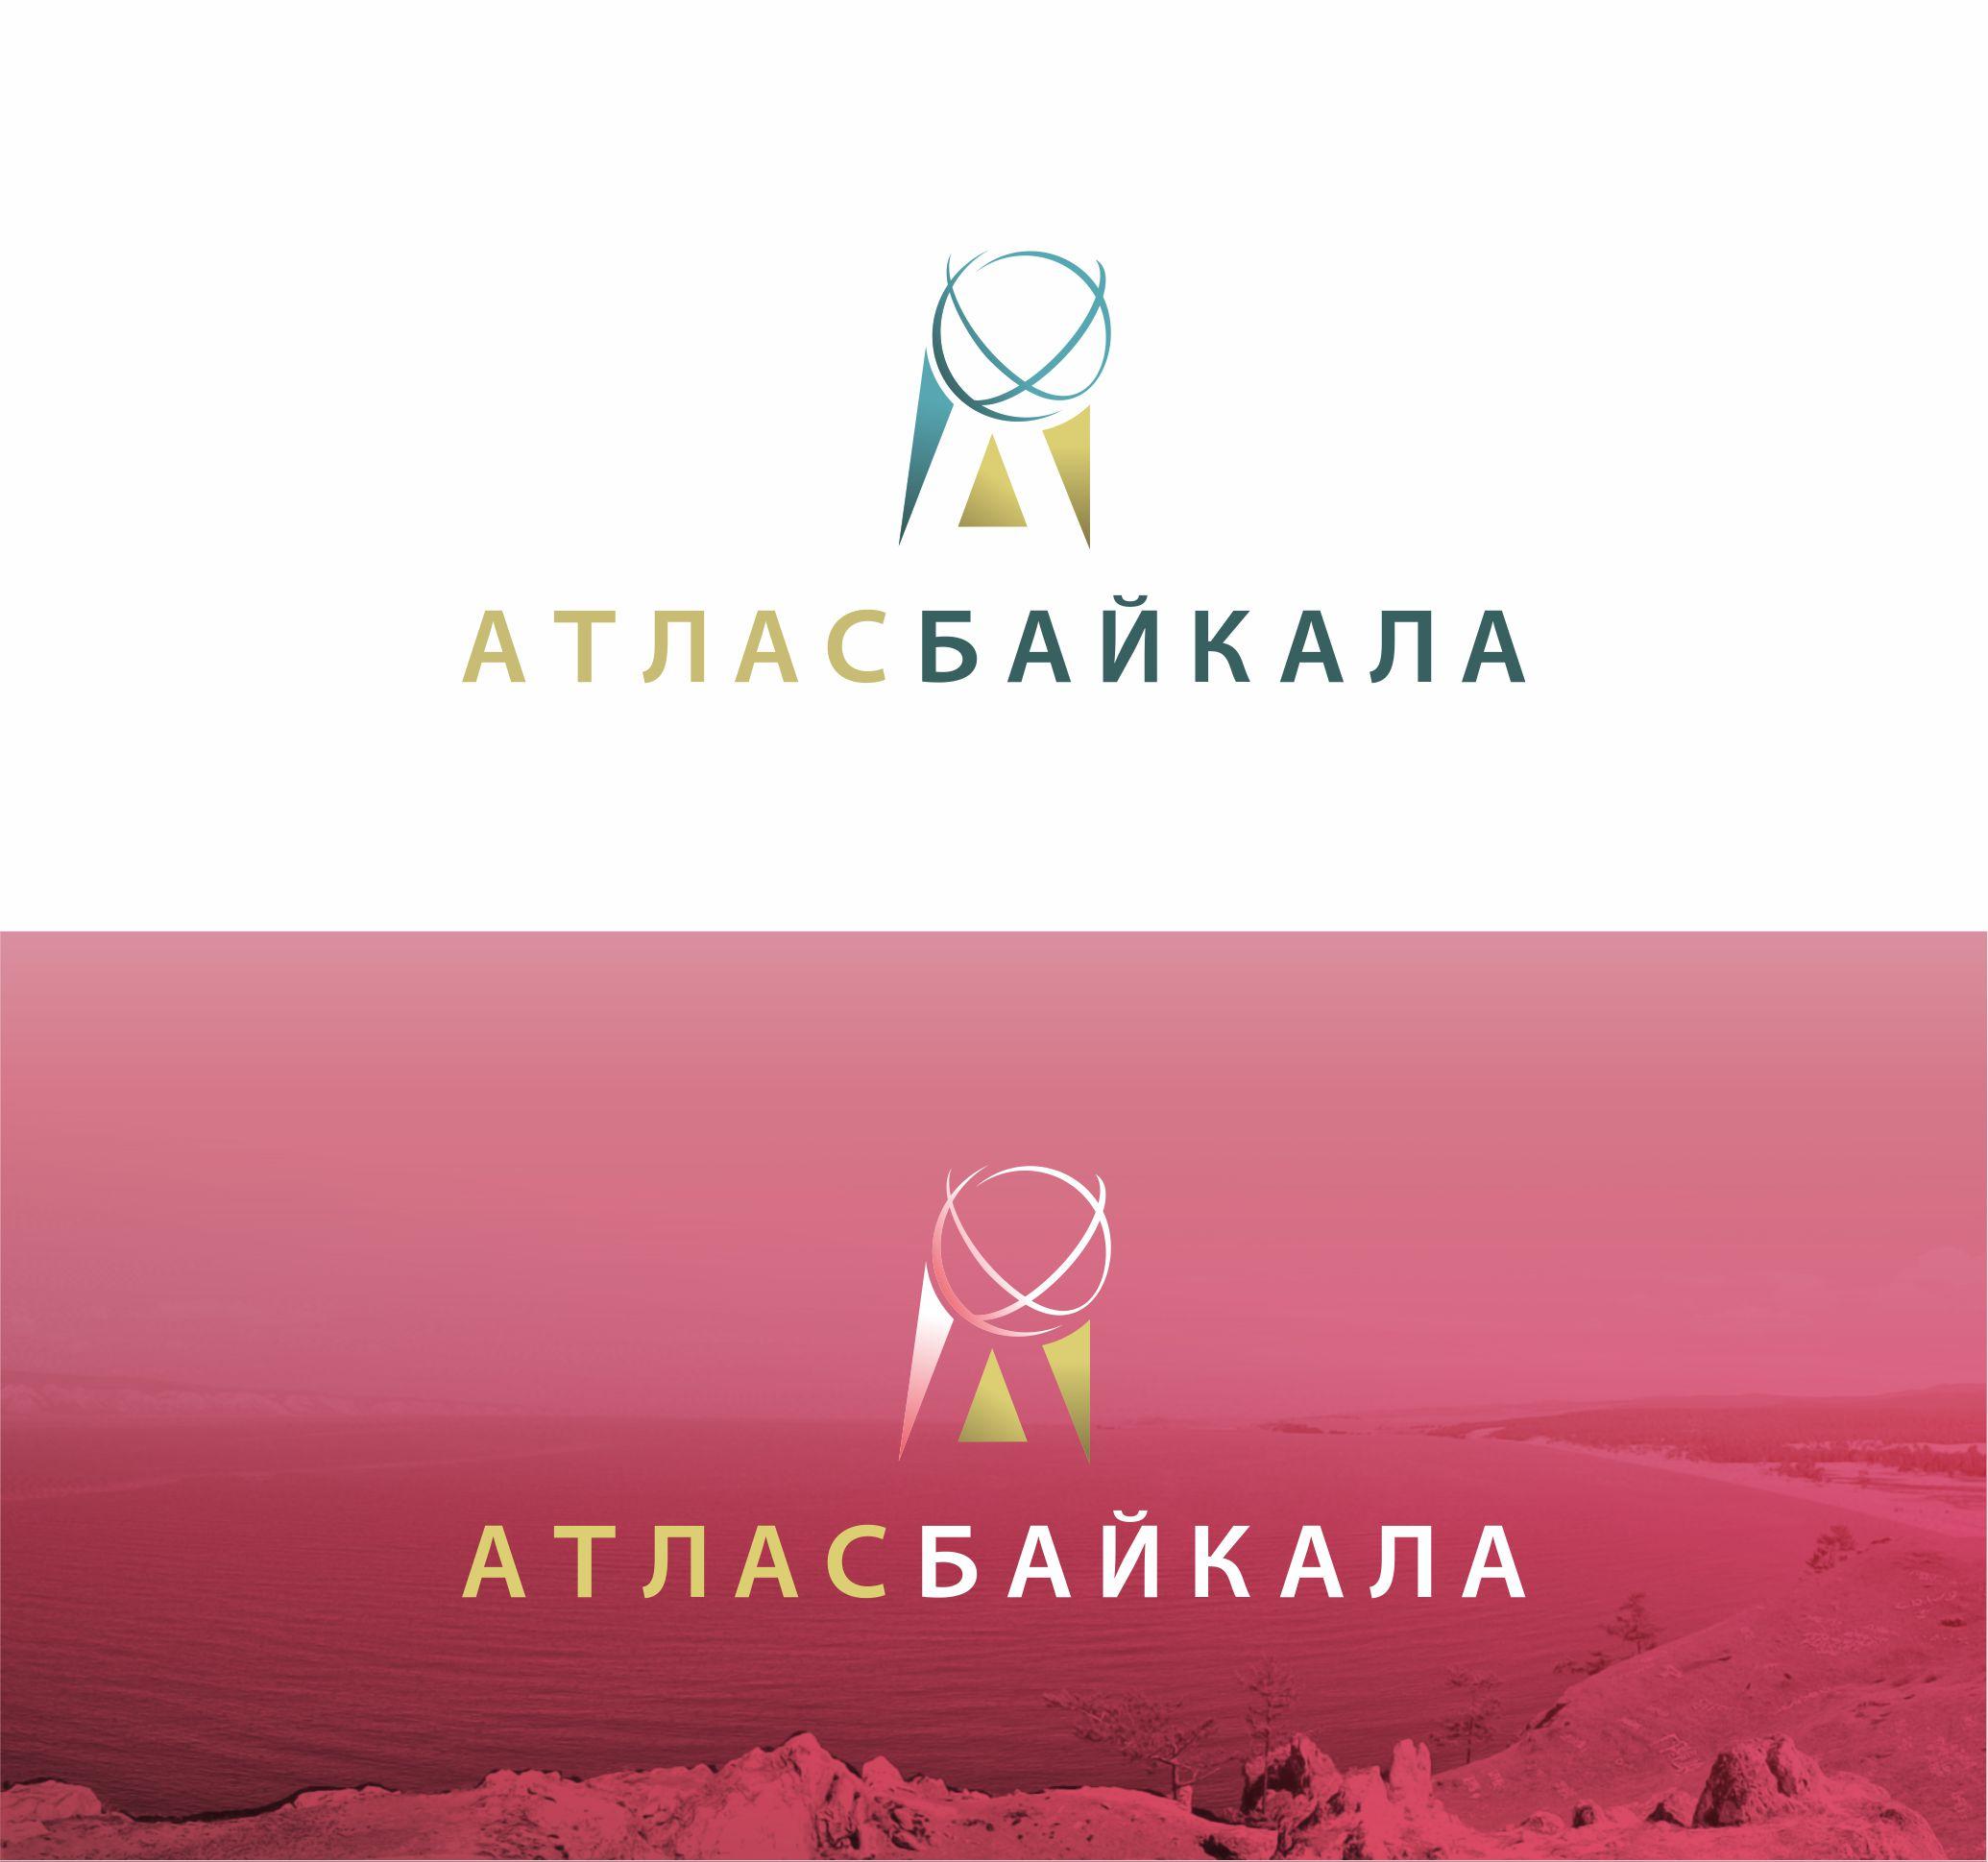 Разработка логотипа Атлас Байкала фото f_7555afc8e38b4c52.jpg